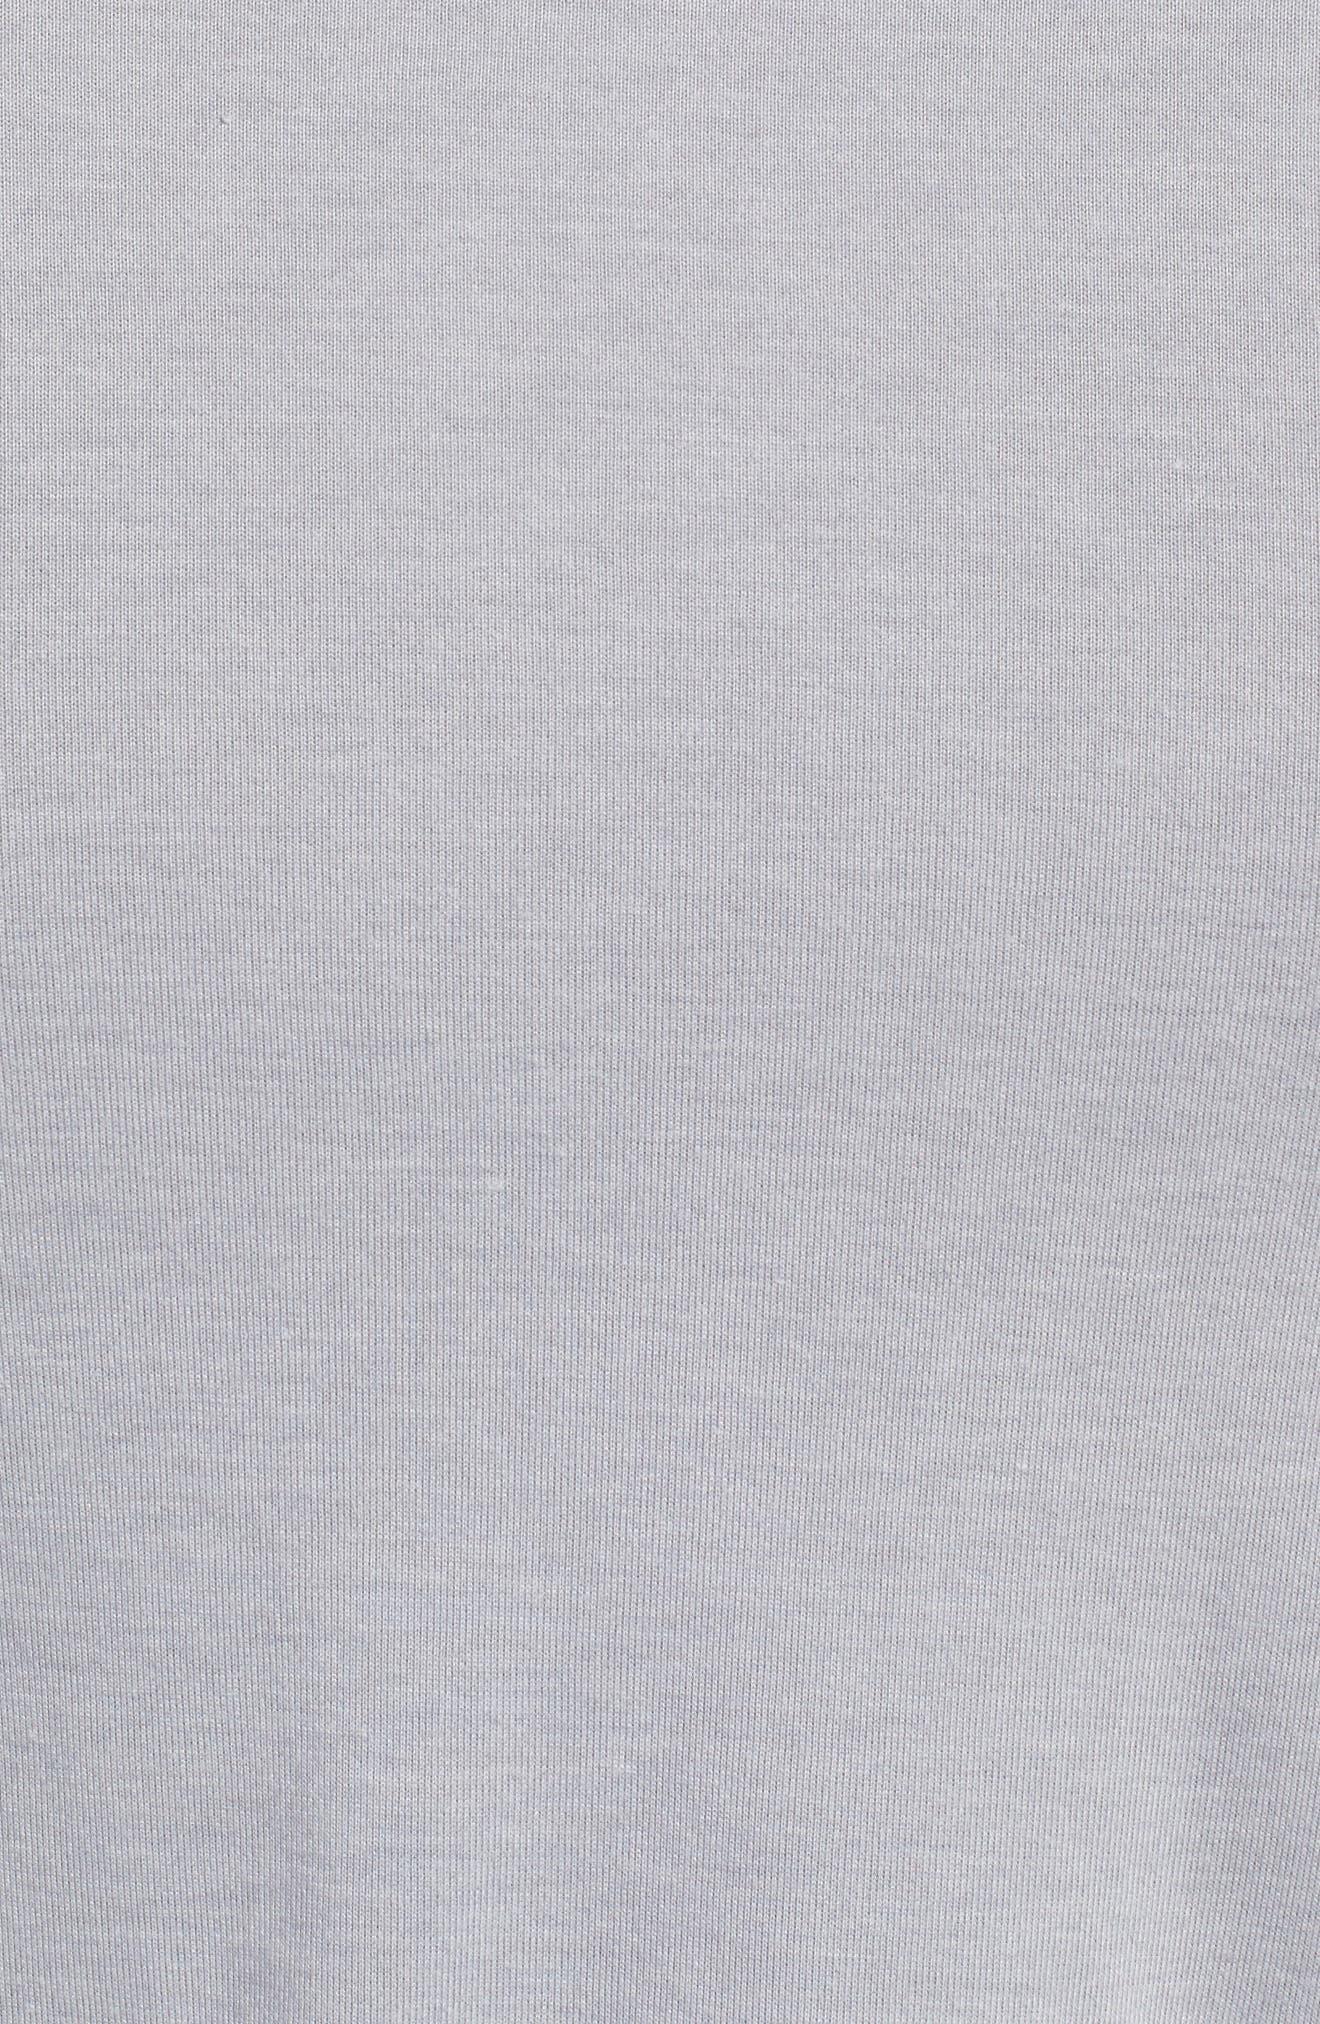 Alternate Image 5  - Zella Celsian Training T-Shirt